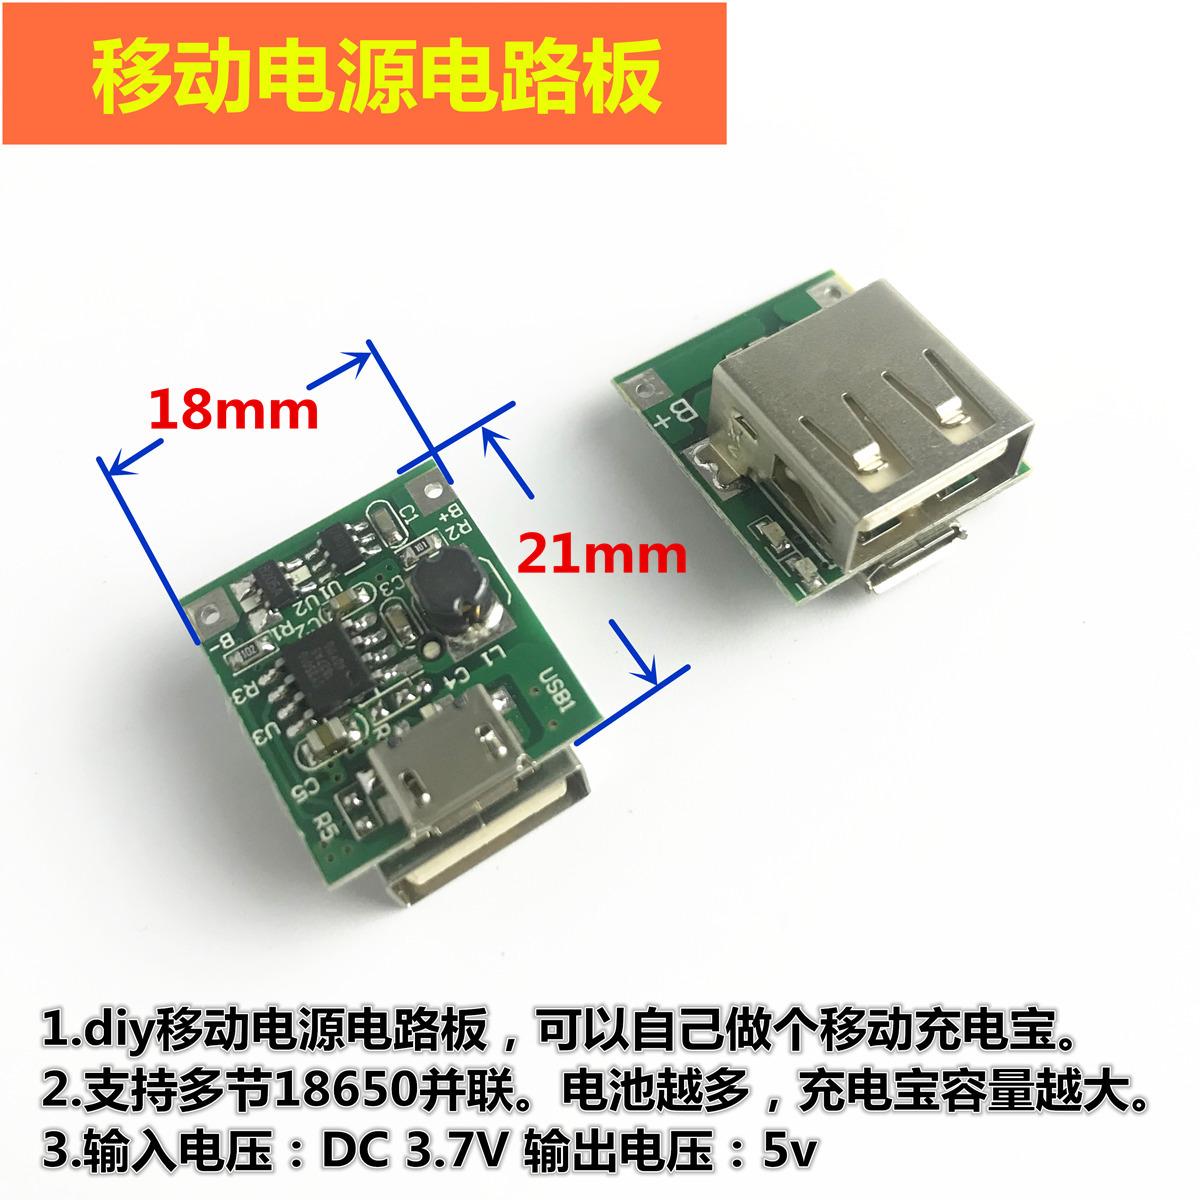 diy电路板移动电源主板手机充电宝pcba线电路板超低静态电流功耗